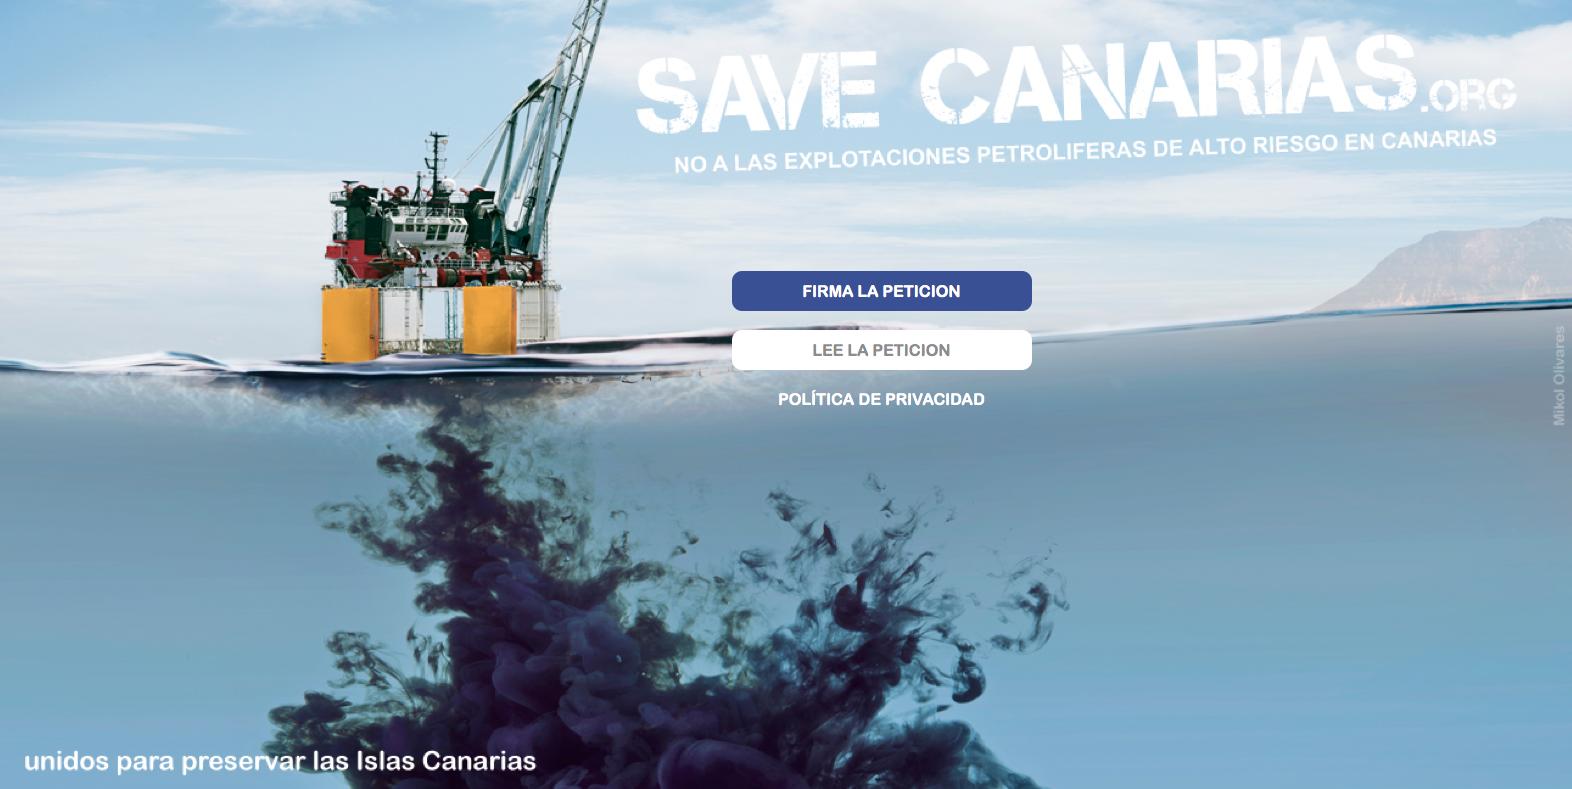 http://www.savecanarias.org/